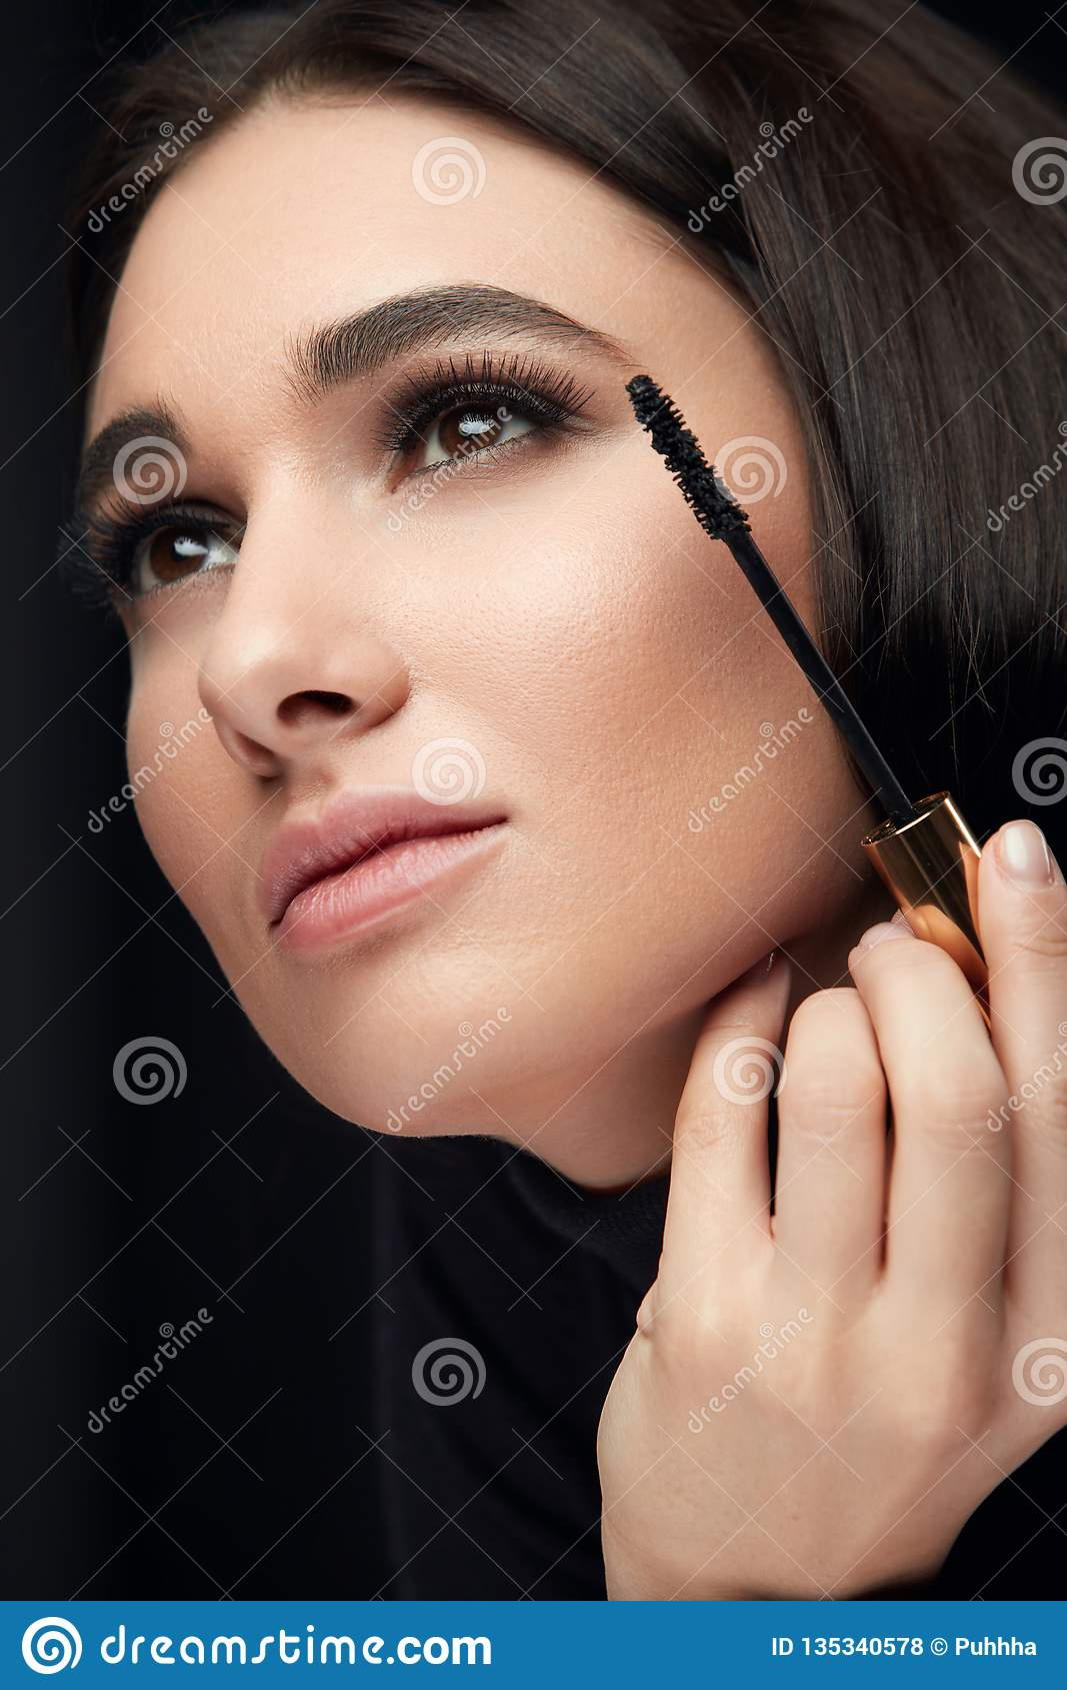 Mascaramake-up Schoonheid Modelputting black mascara op Wimpers